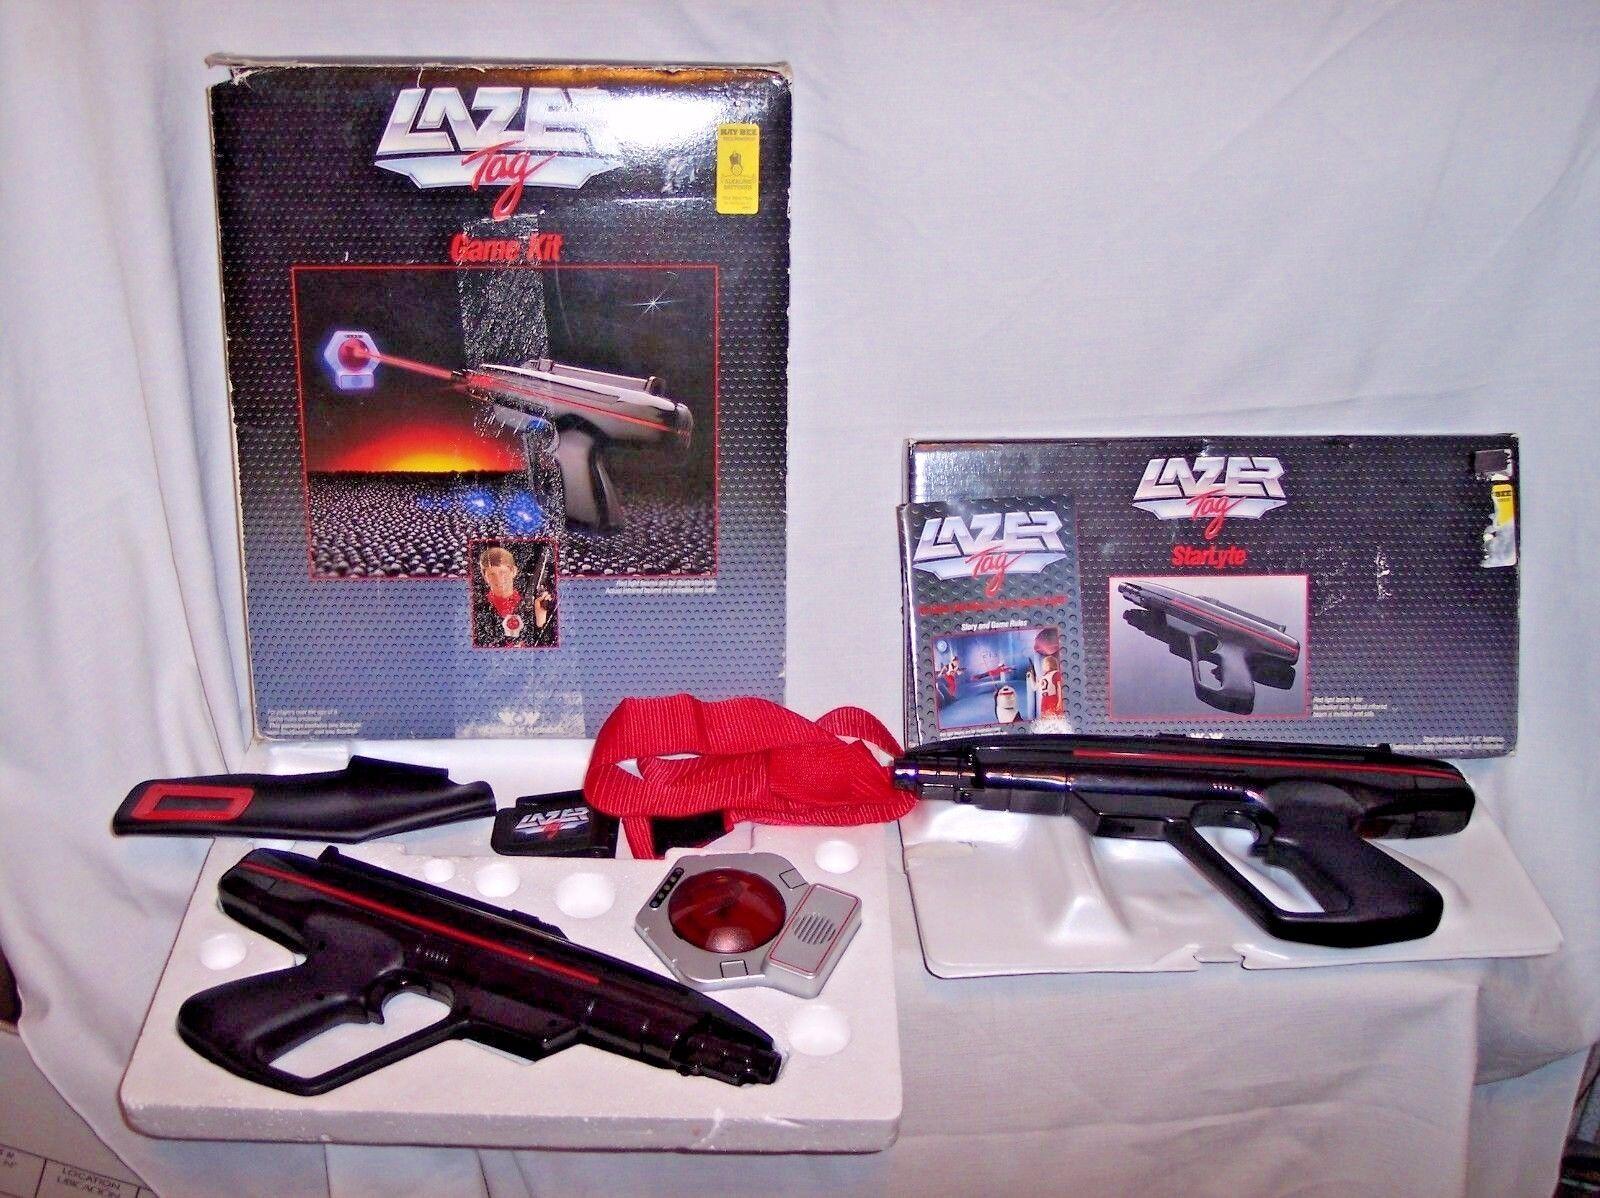 Viele jahrgang 1987 lazer tag starlyte pro gewehr - sensor setzen